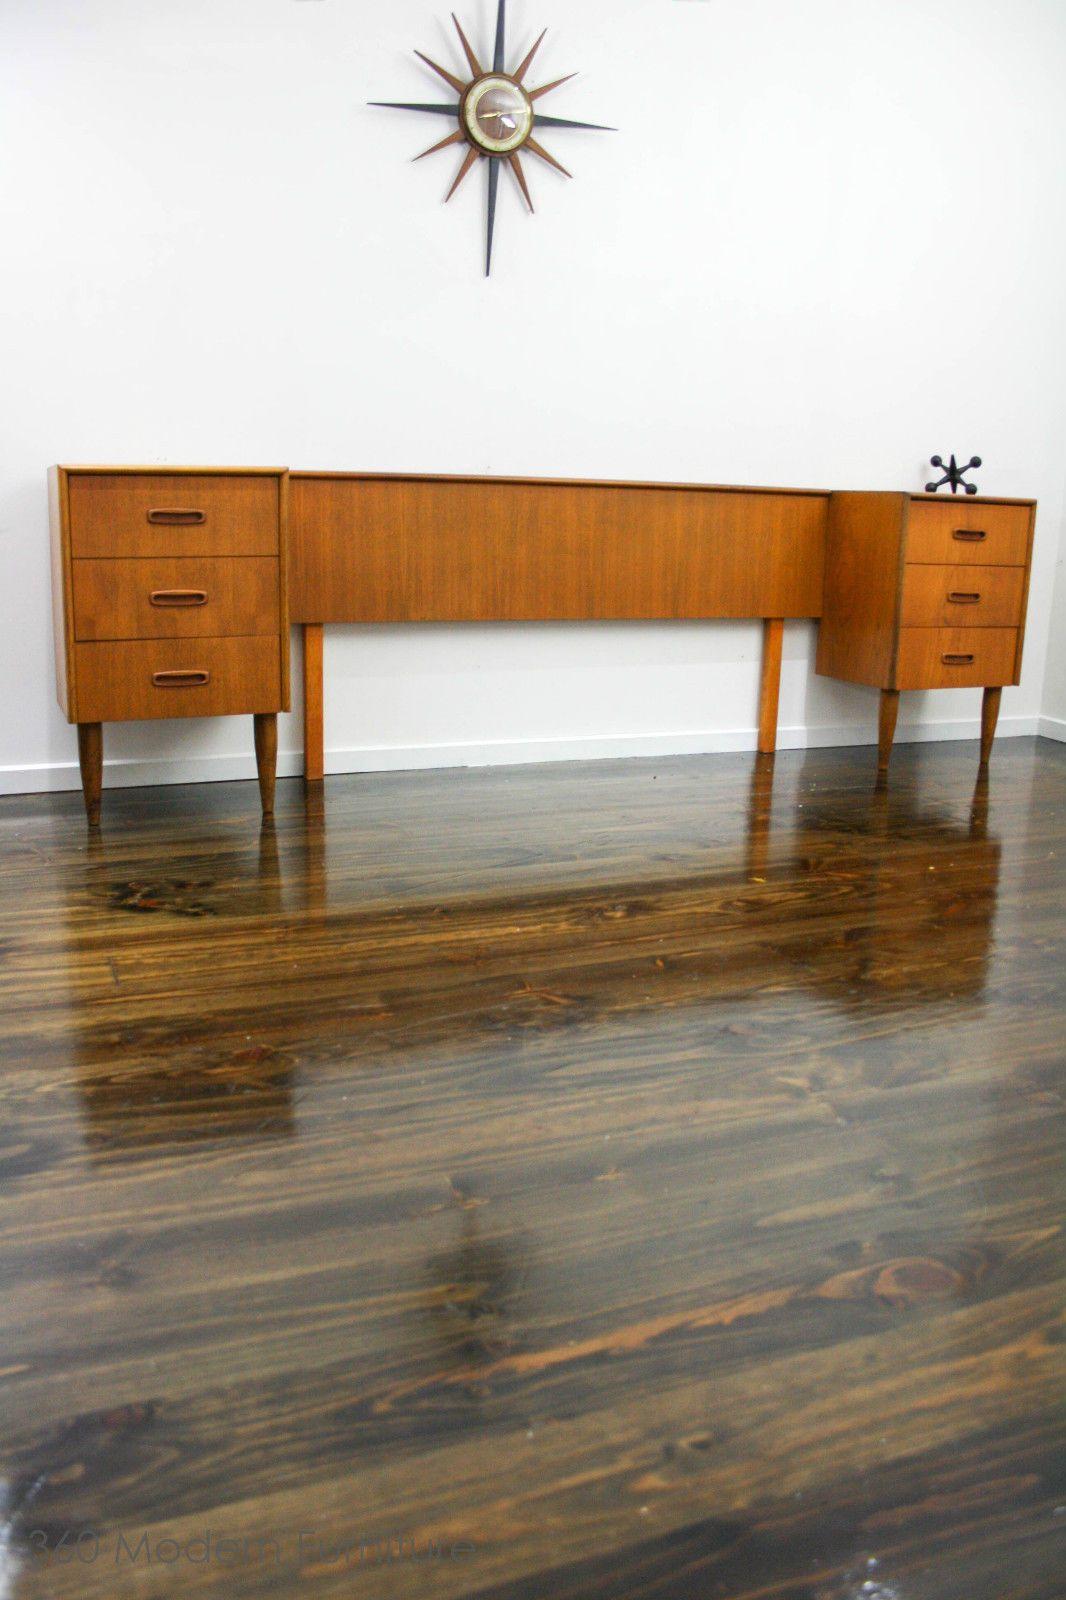 Mid century qs bedhead bedside tables drawers retro vintage danish parker eames in narre warren 360 modern furniture vic ebay